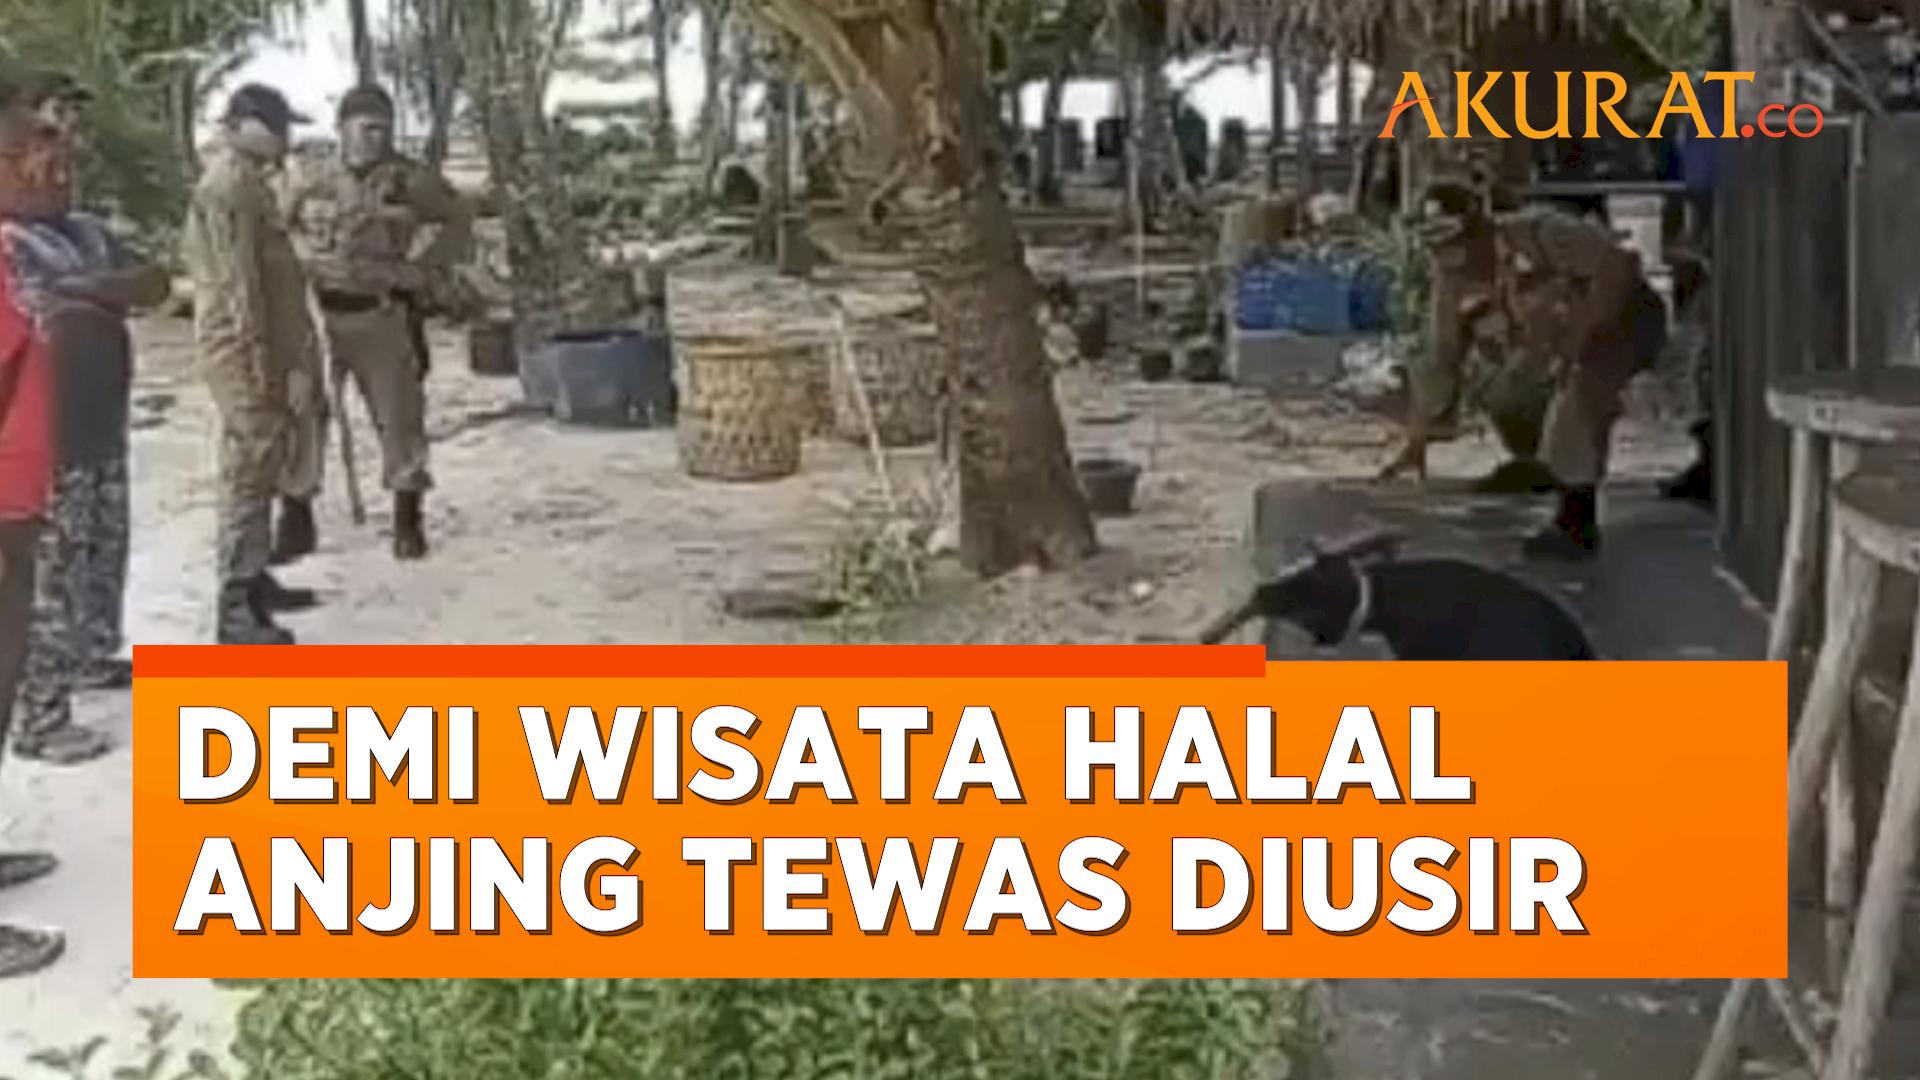 Demi Kawasan Wisata Halal, Seekor Anjing Diusir Aparat Hingga Tewas